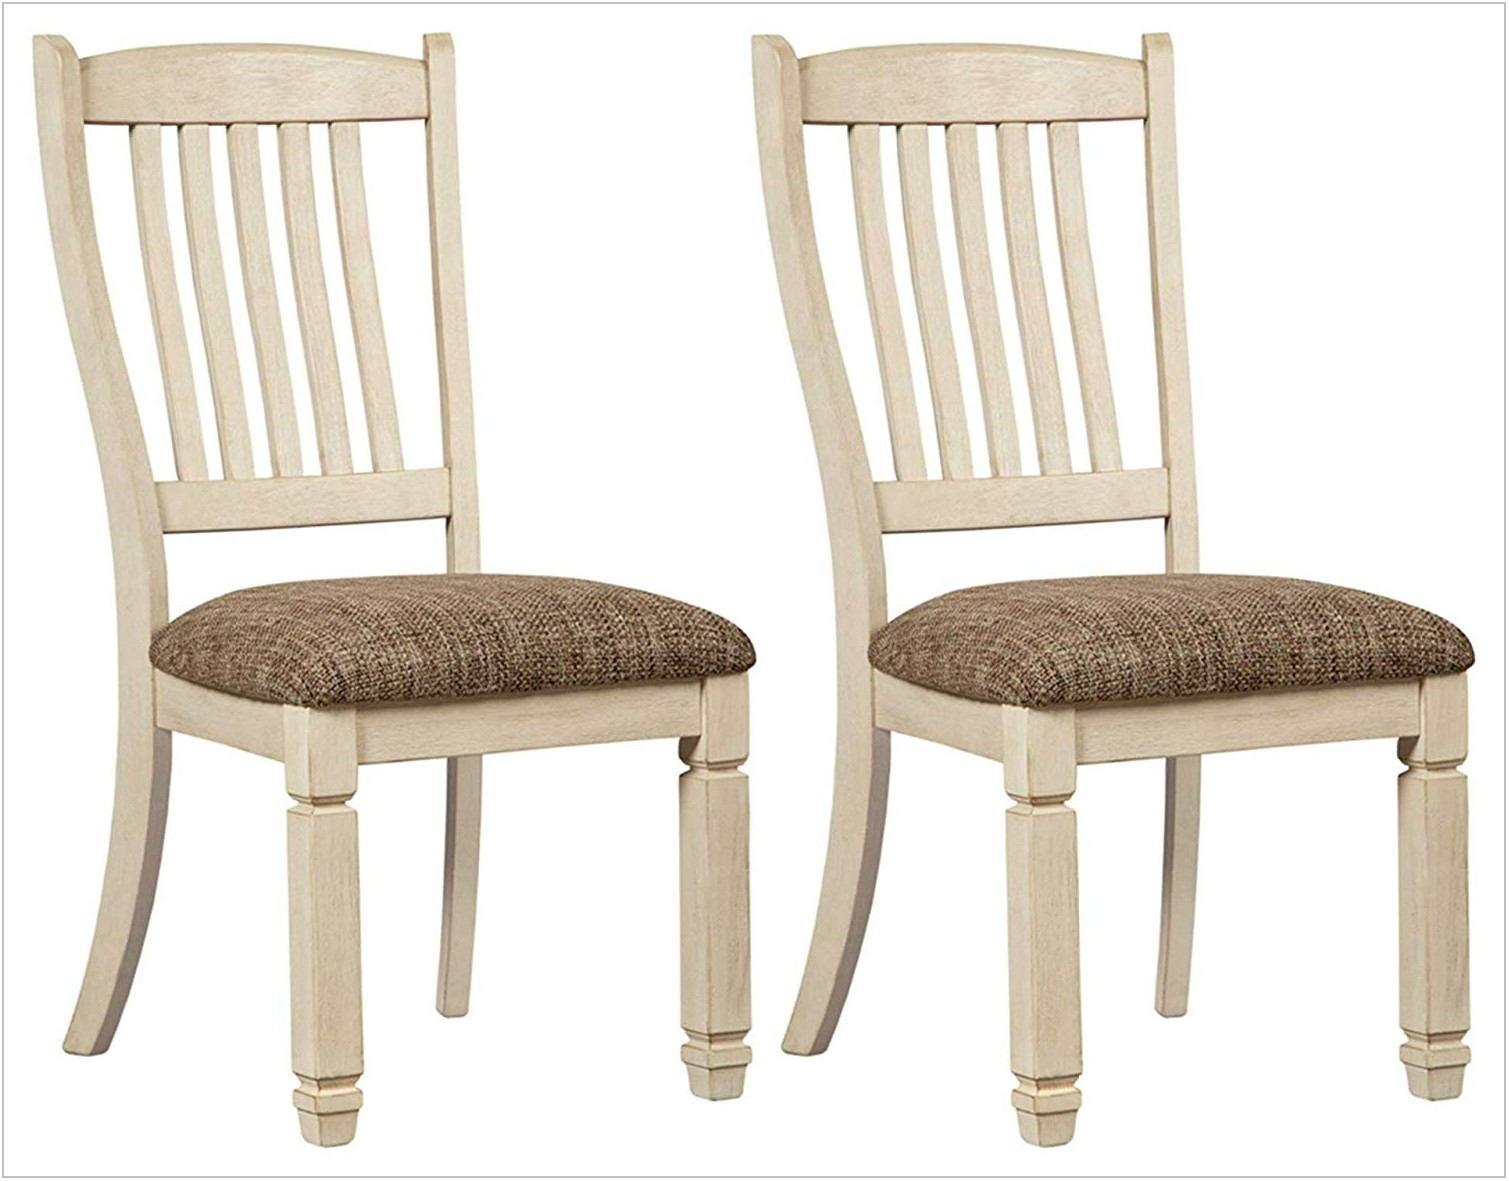 Bolanburg Dining Room Chair